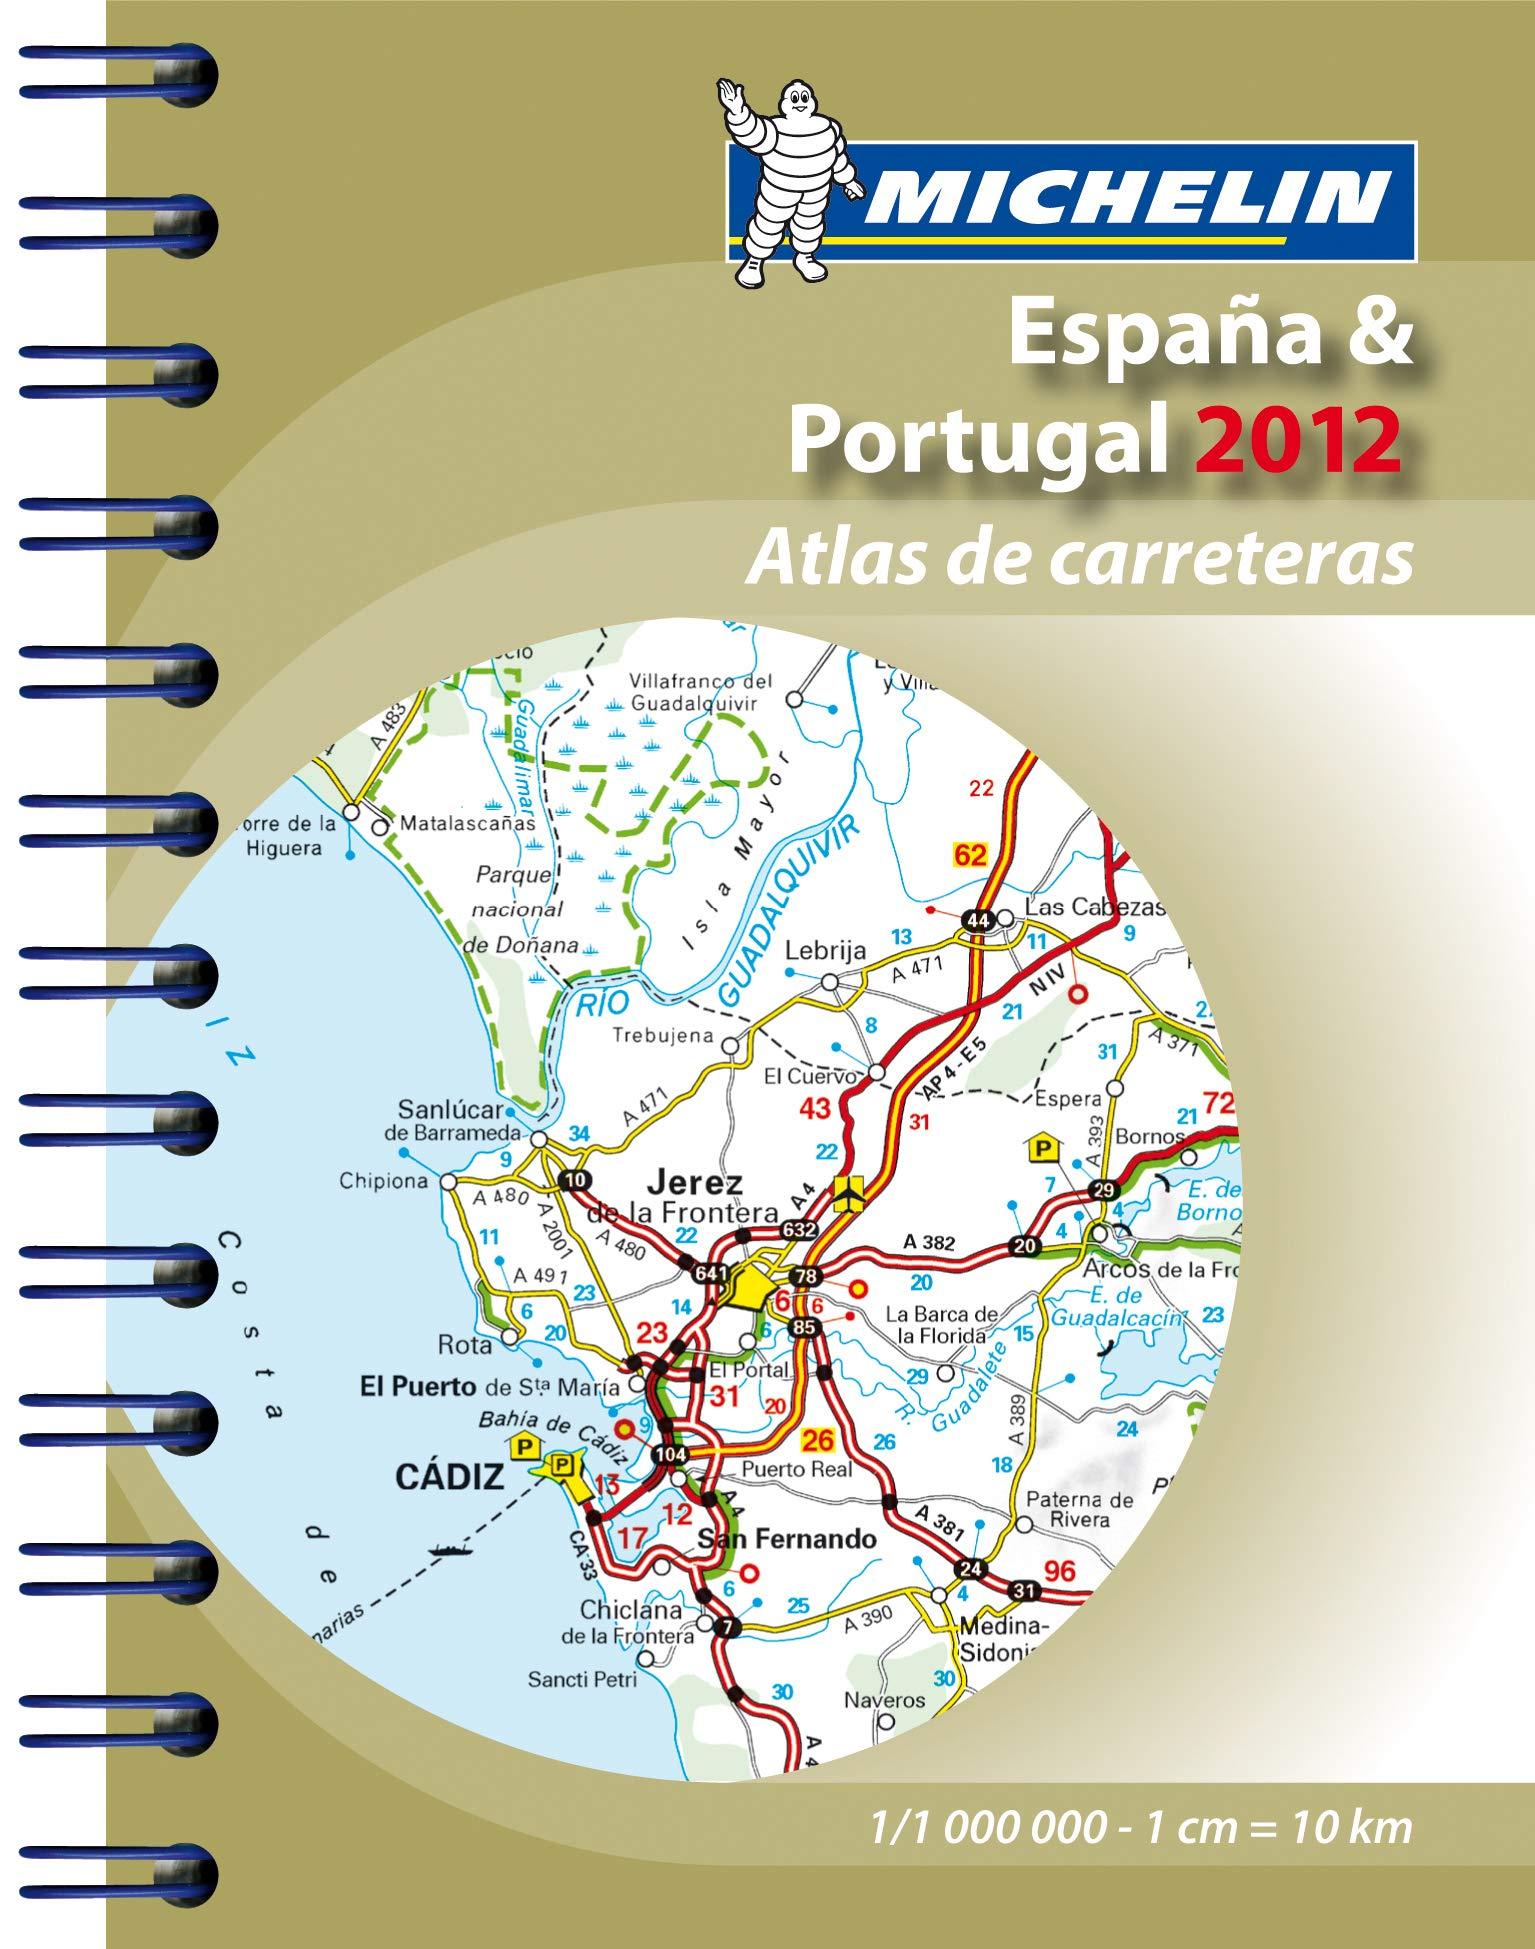 Mini-Atlas España & Portugal 2012 Michelin Tourist and Motoring Atlases: Amazon.es: Collectif: Libros